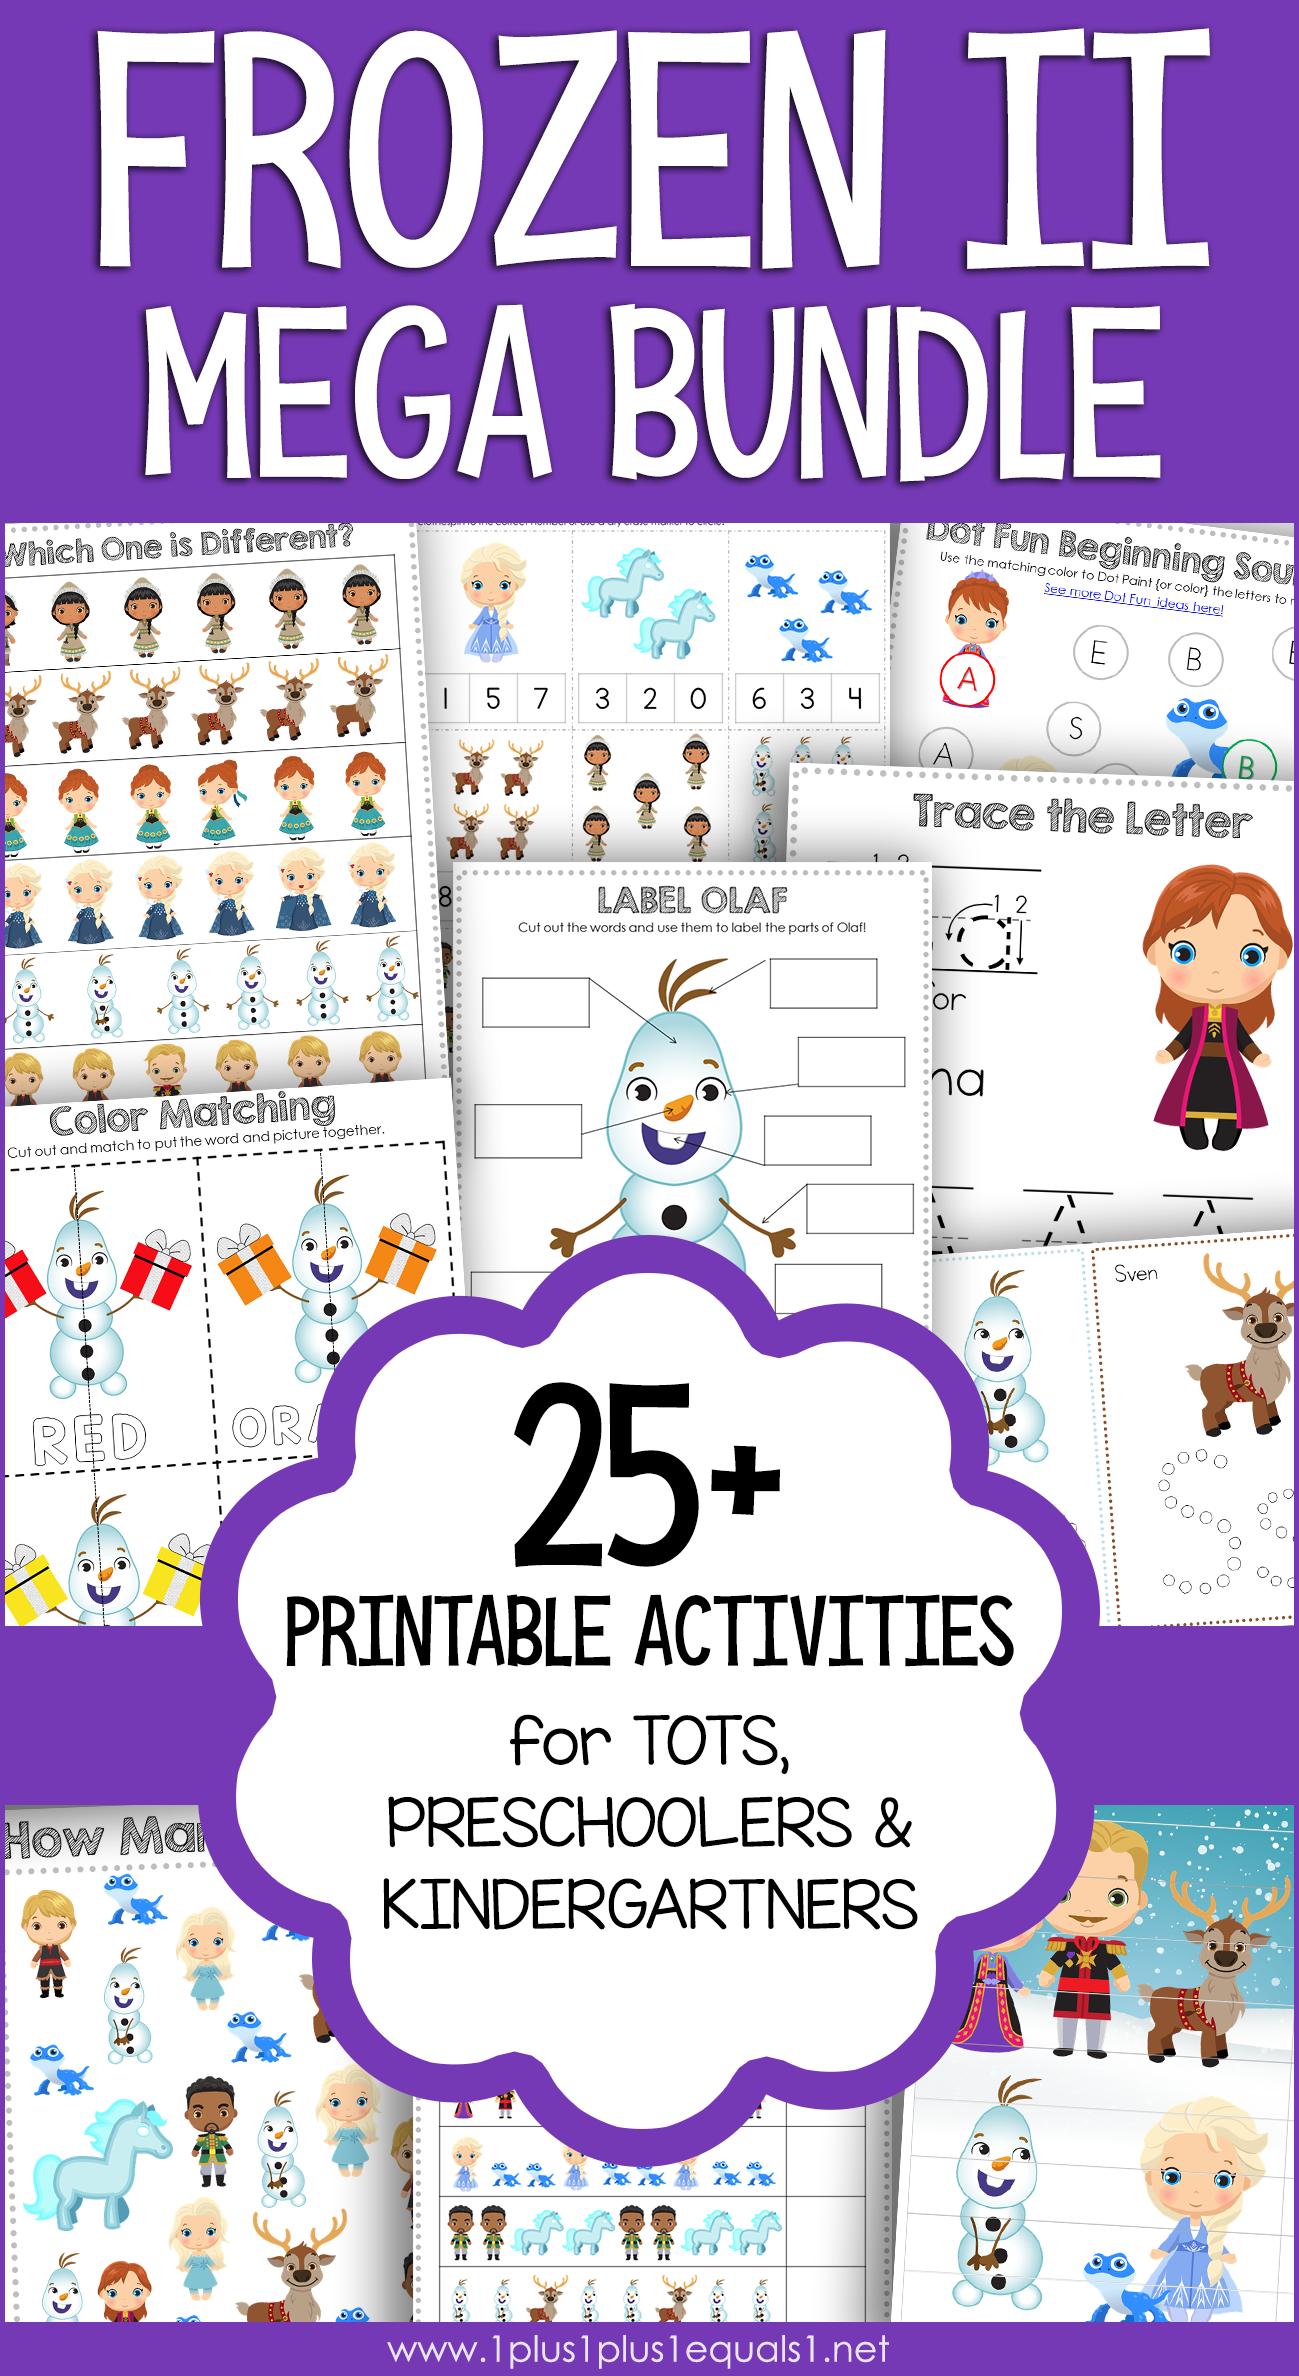 Printable Activities By Lori Campbell On Preschool